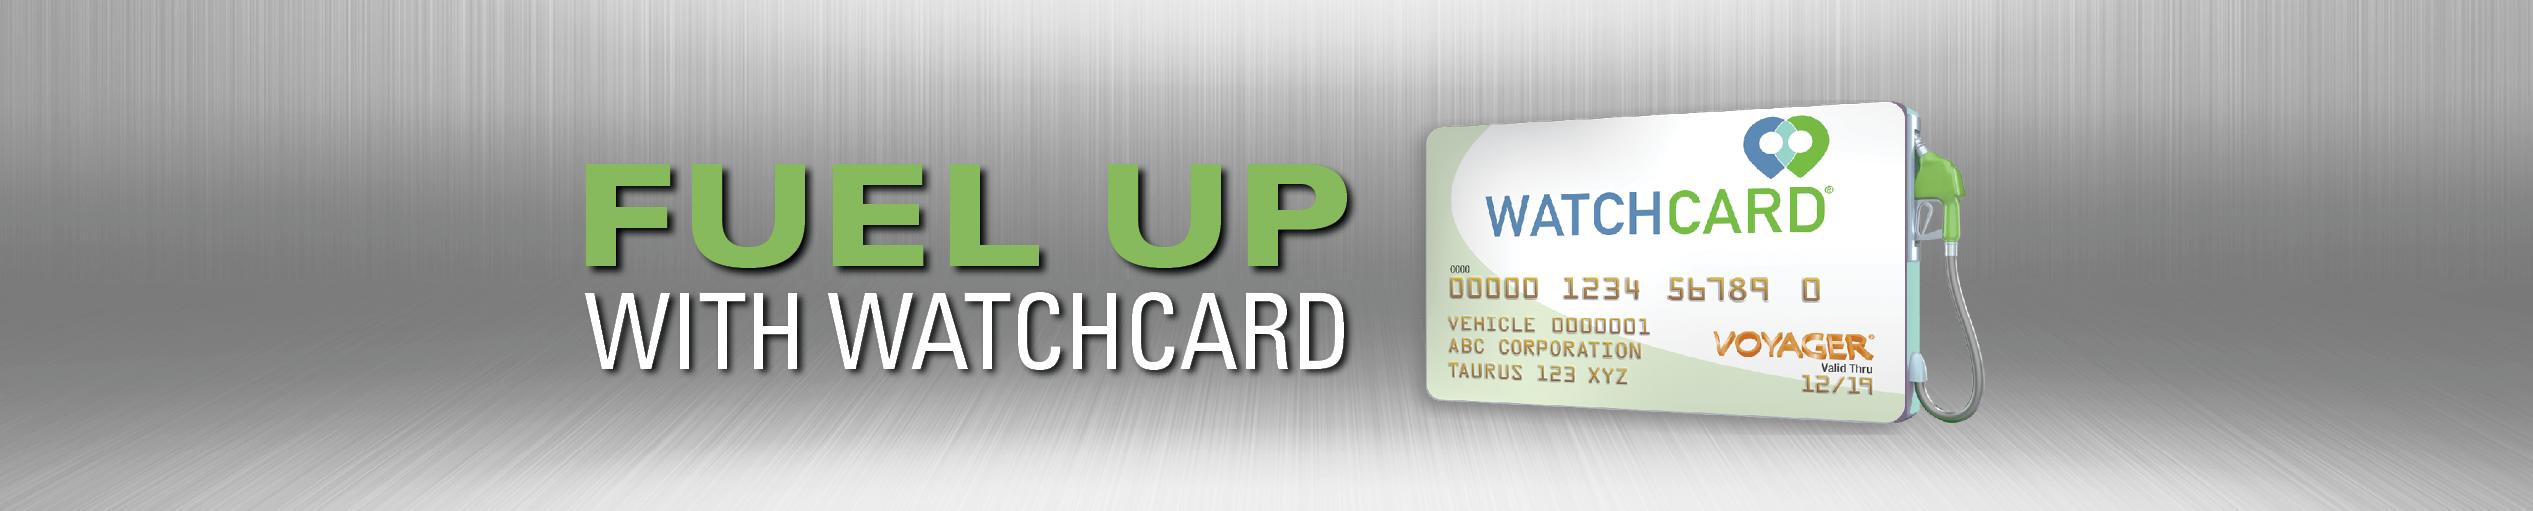 Watchcard Nationwide Fuel Card | National Fleet Fueling Card